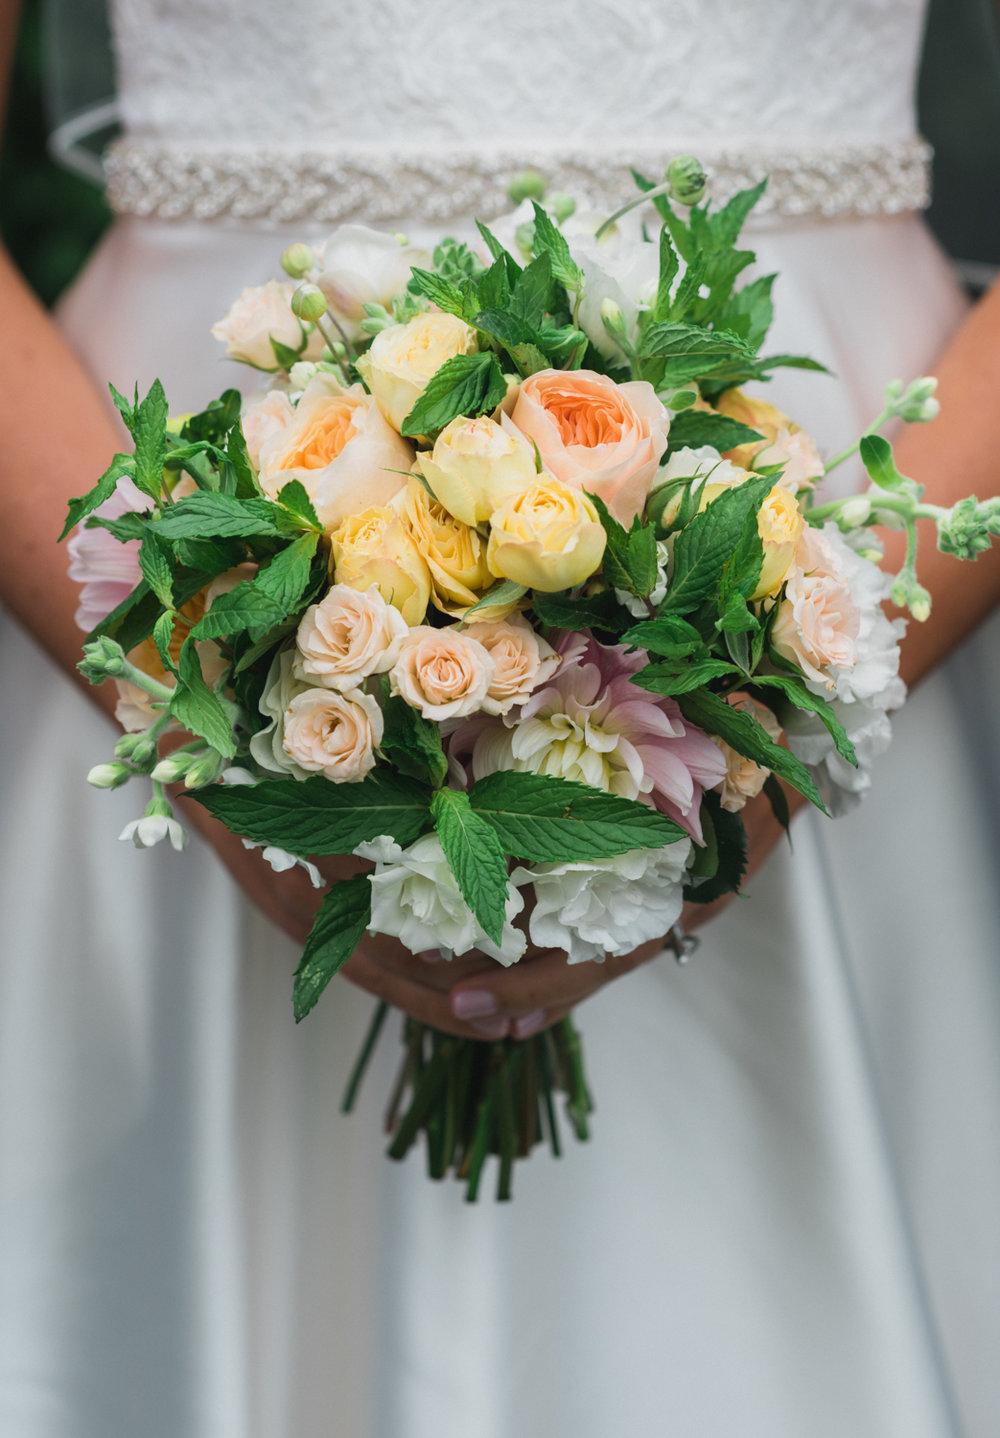 maureen_evan_bridal_wedding_bouquet_by morrice_florist_marthas_vineyard-3175.jpg